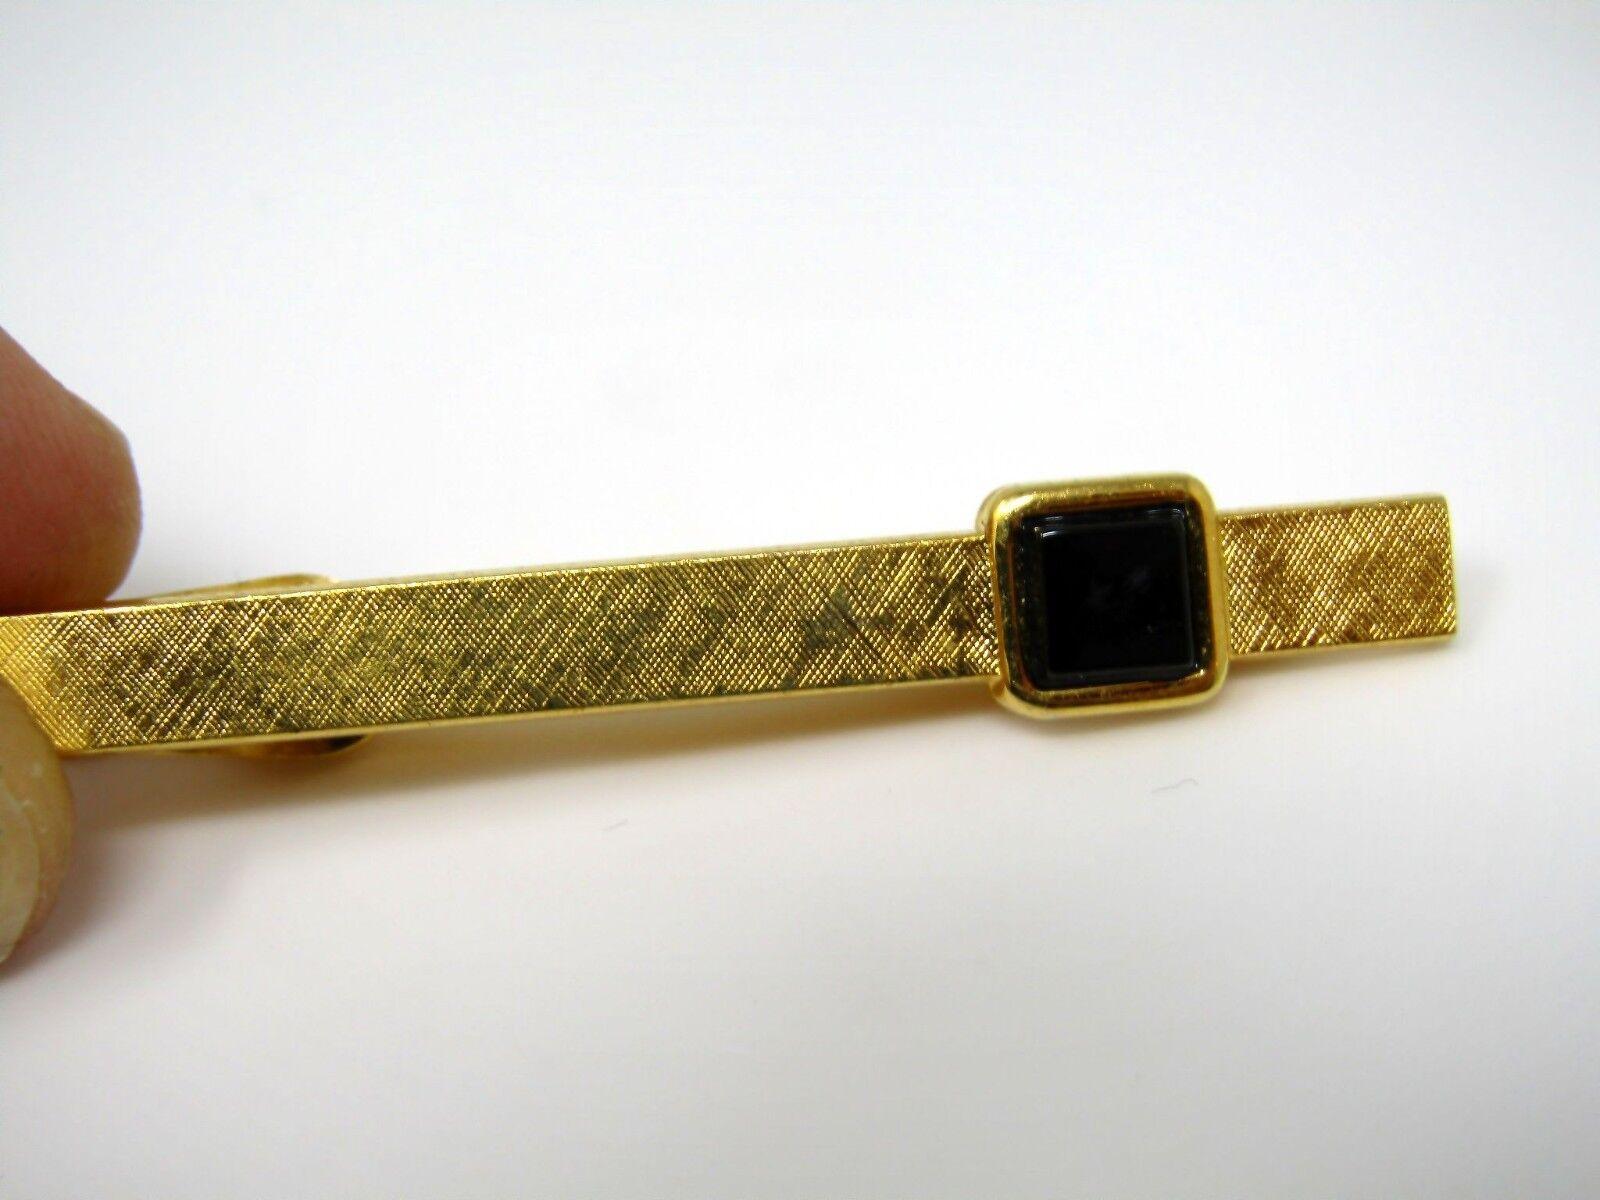 Vintage Tie Clip  Pearlized  Tie Bar  Cabochon  Silver Scroll  Ornate Design  Wedding  Gentlemen  Suit  Tie Accessories  Gold Tone